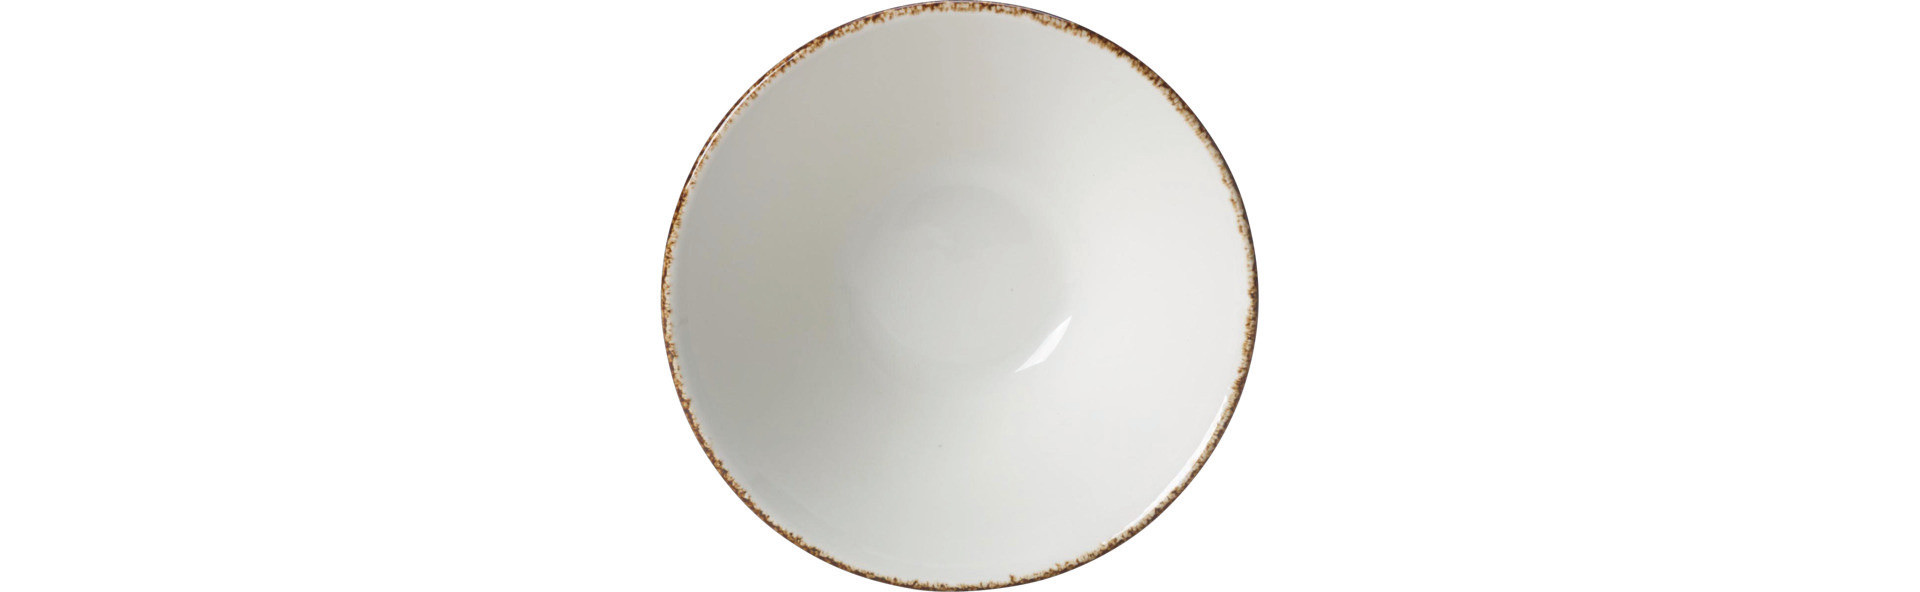 Brown Dapple, Bowl Essence ø 112 mm